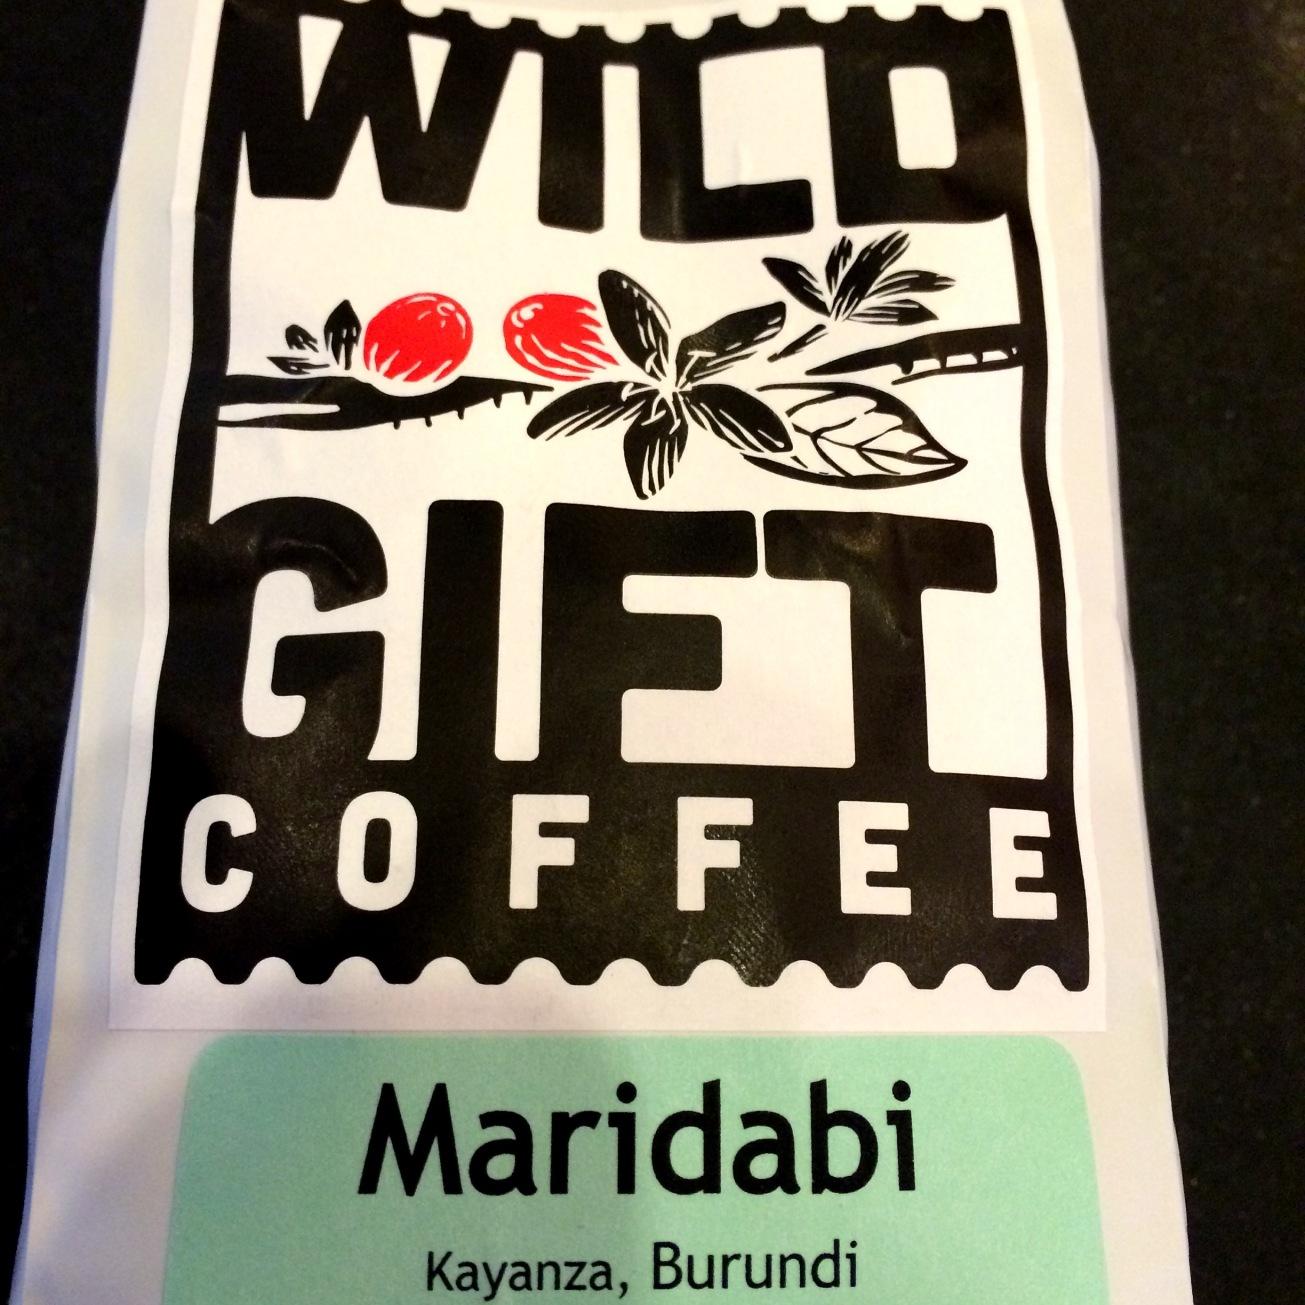 Wild Gift Maridabi Coffee